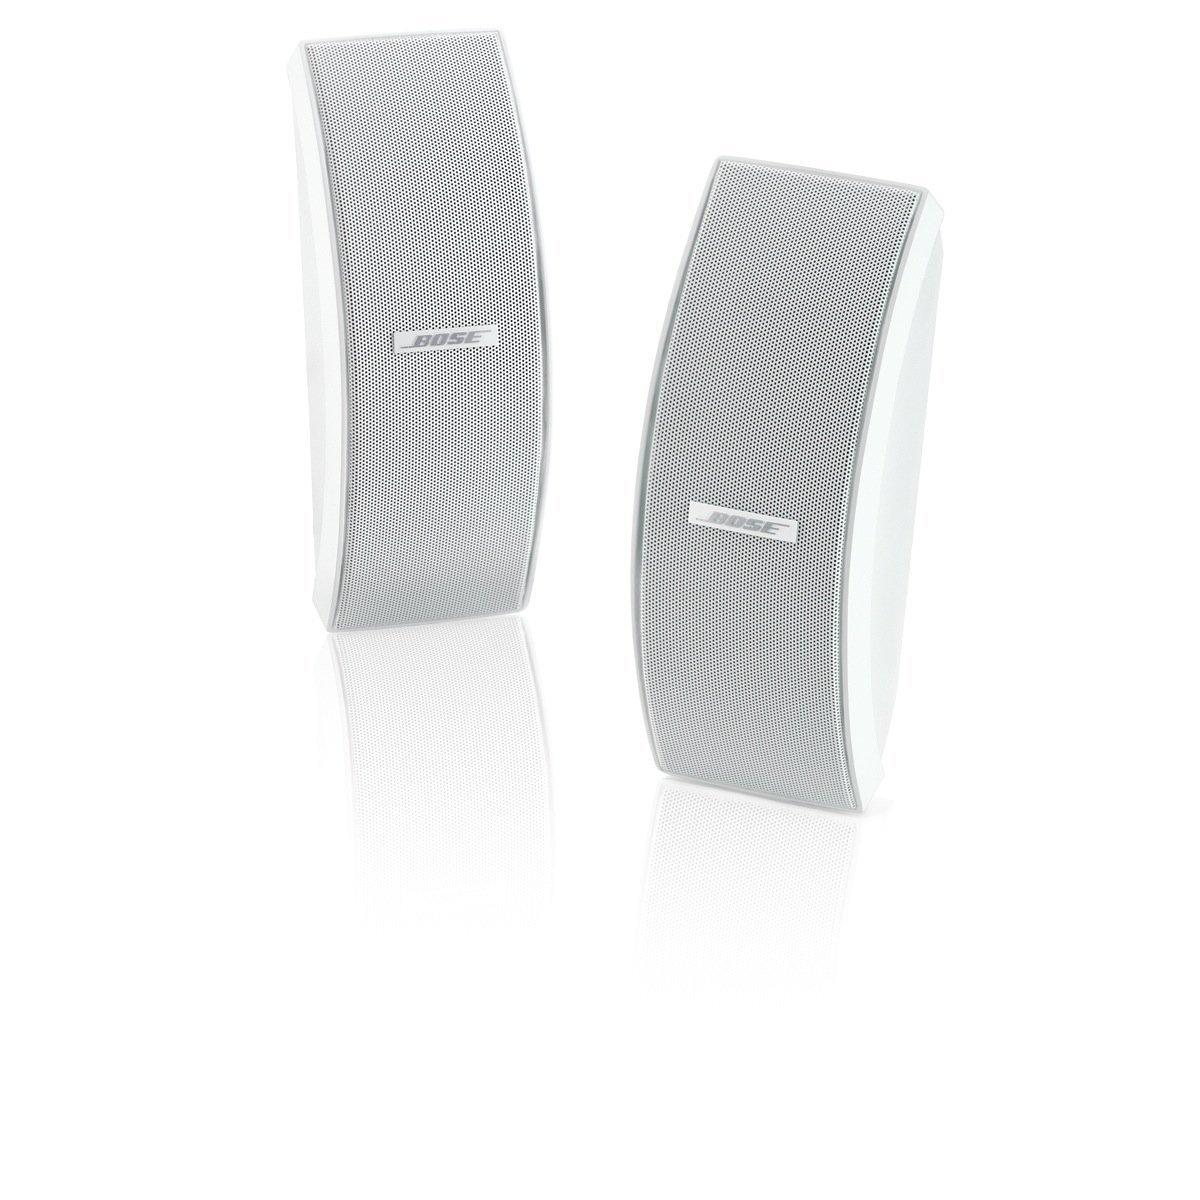 Bose 151 SE Elegant Outdoor Speakers (White) [並行輸入品] B06ZXX72HP